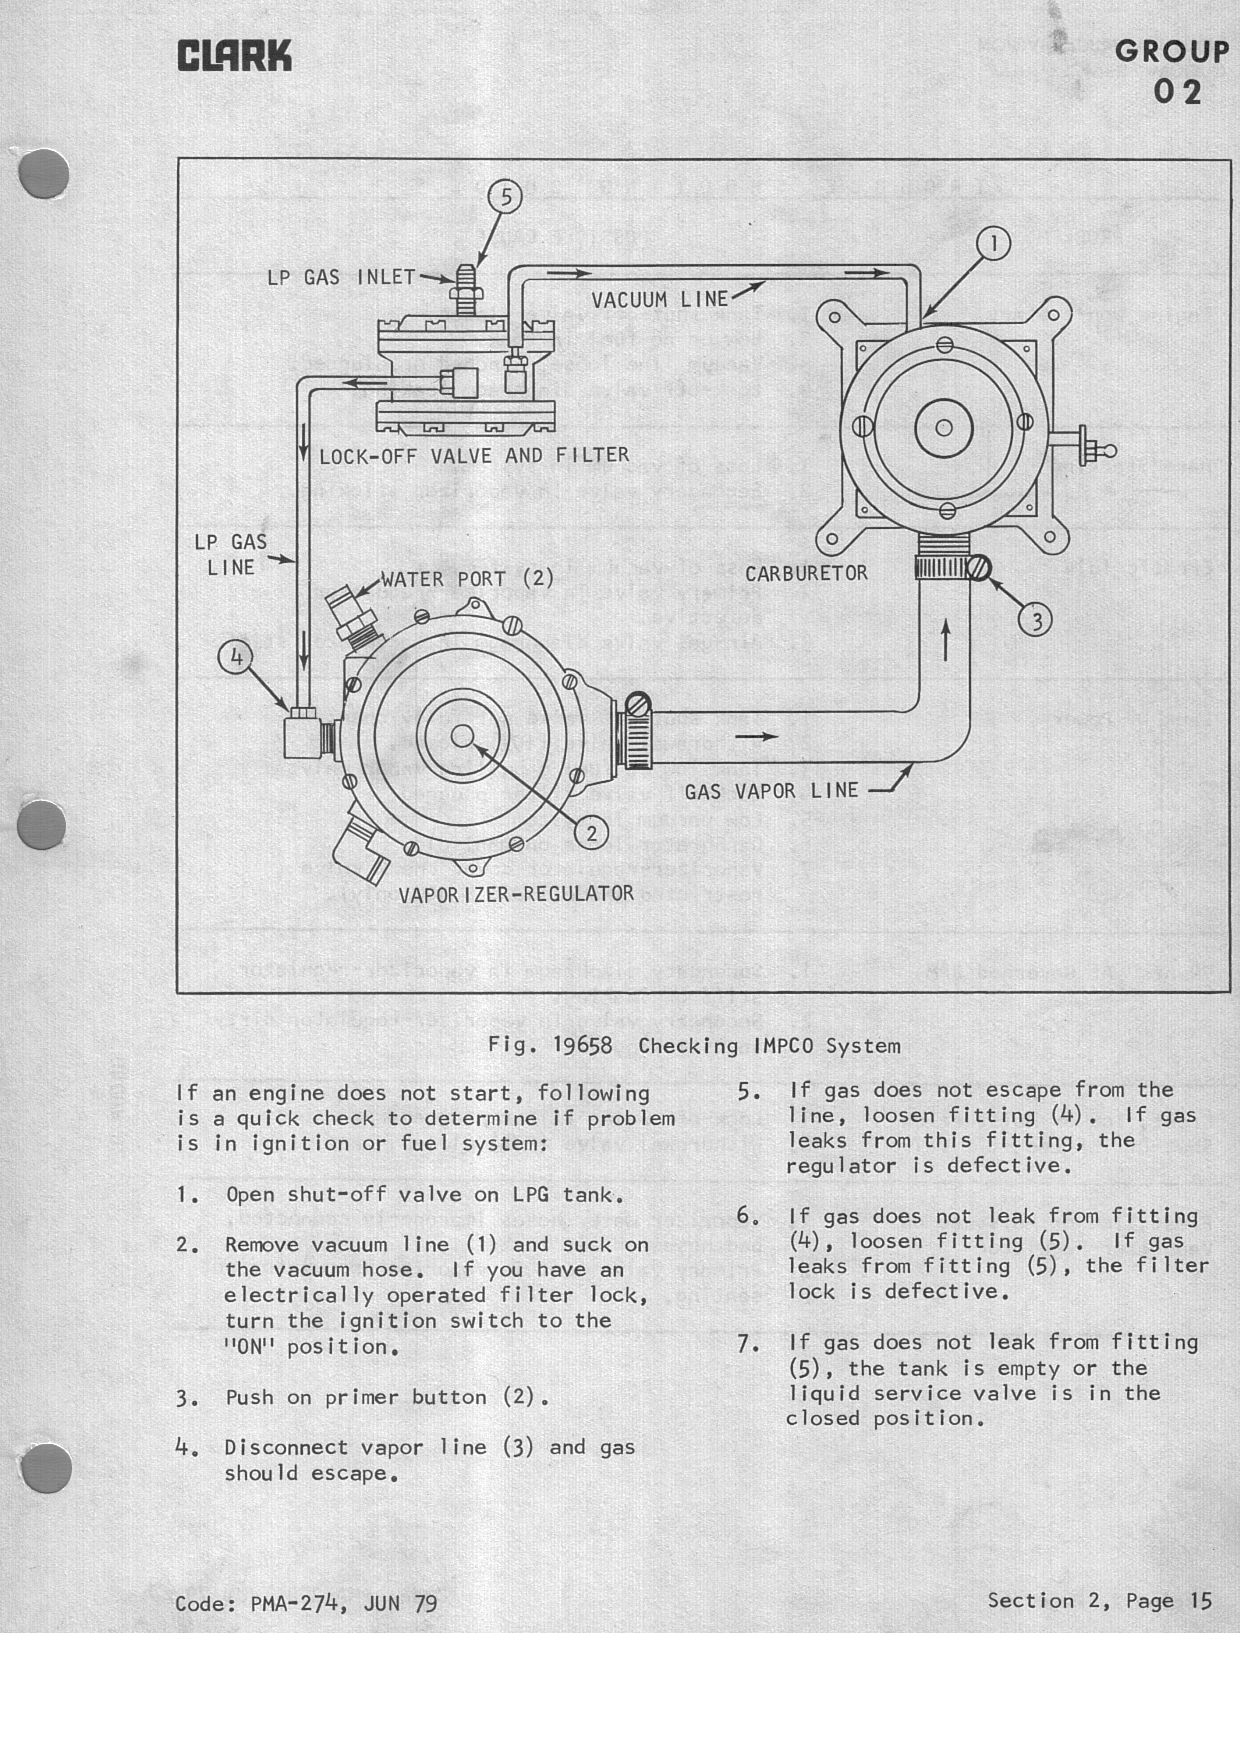 Yale Forklift Wiring Schematic Trusted Diagrams Erc040 Schematics Enthusiast U2022 Toro Z Master